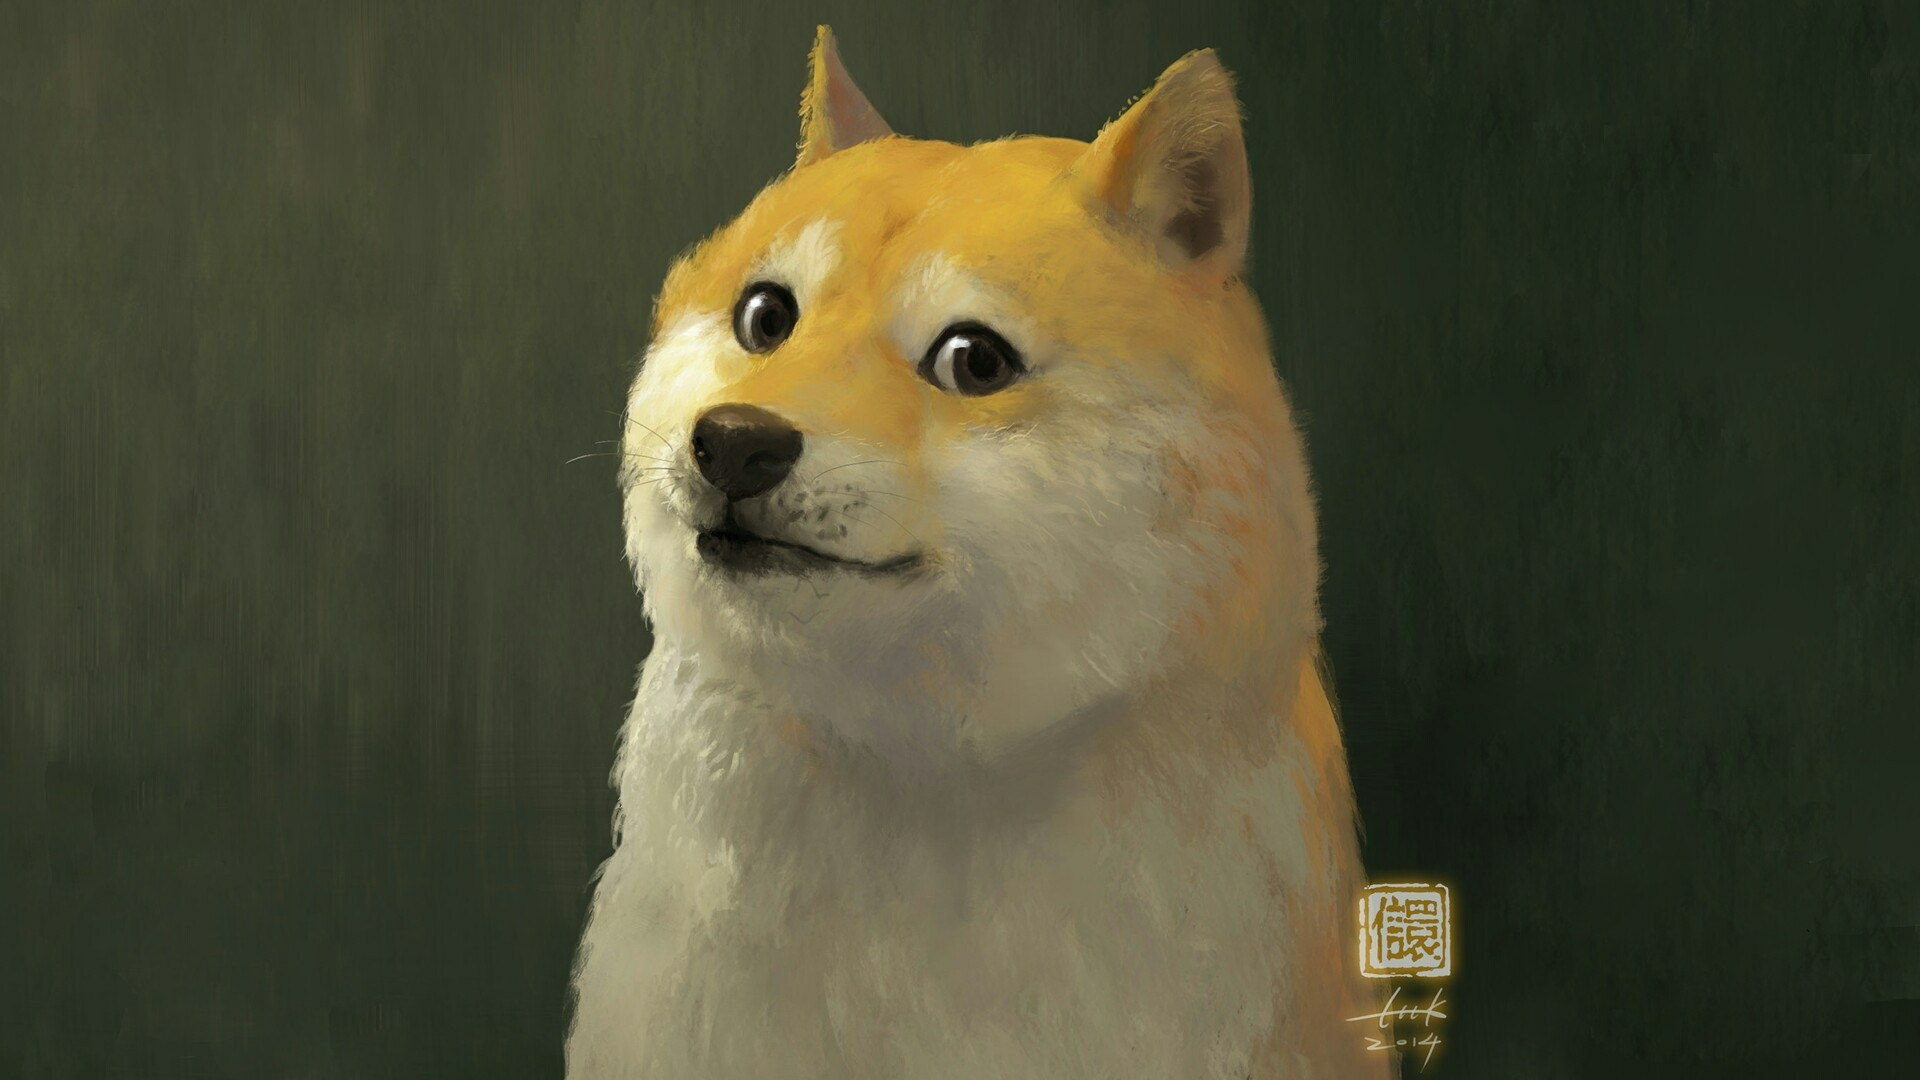 Doge Meme cool wallpaper